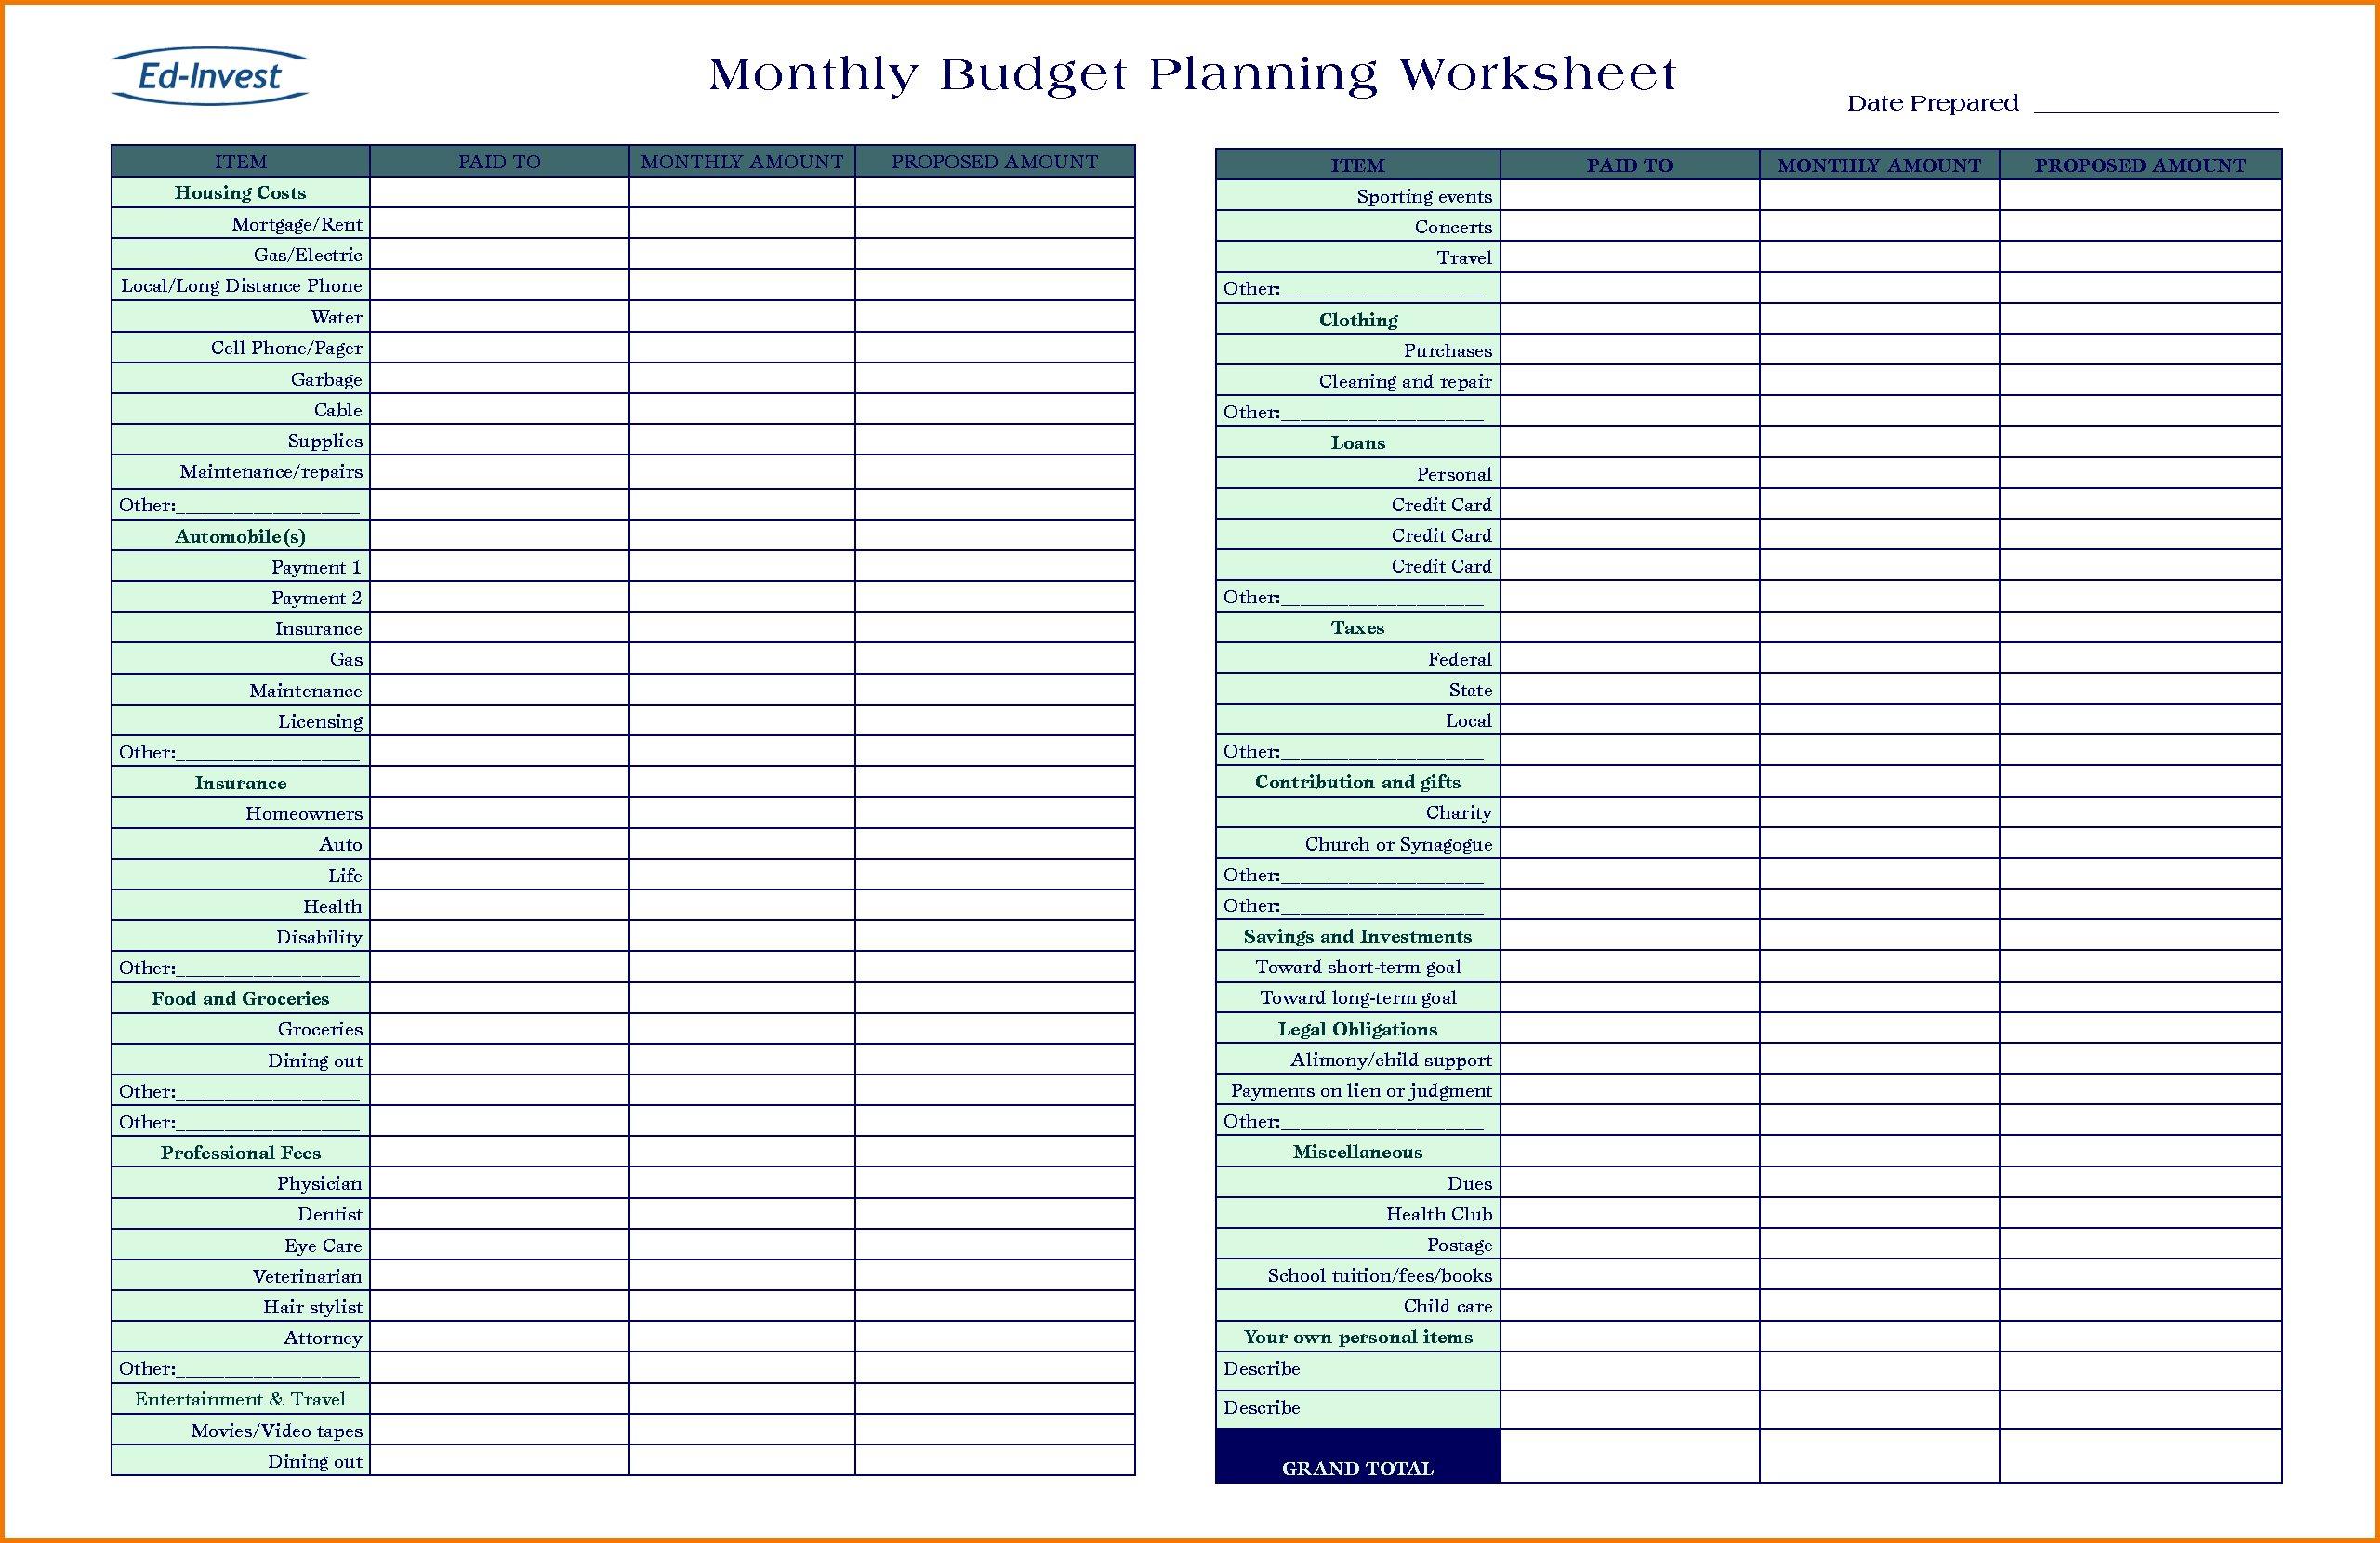 Financial Planning Worksheets  Soccerphysicsonline With Regard To Turbotap Financial Planning Worksheet